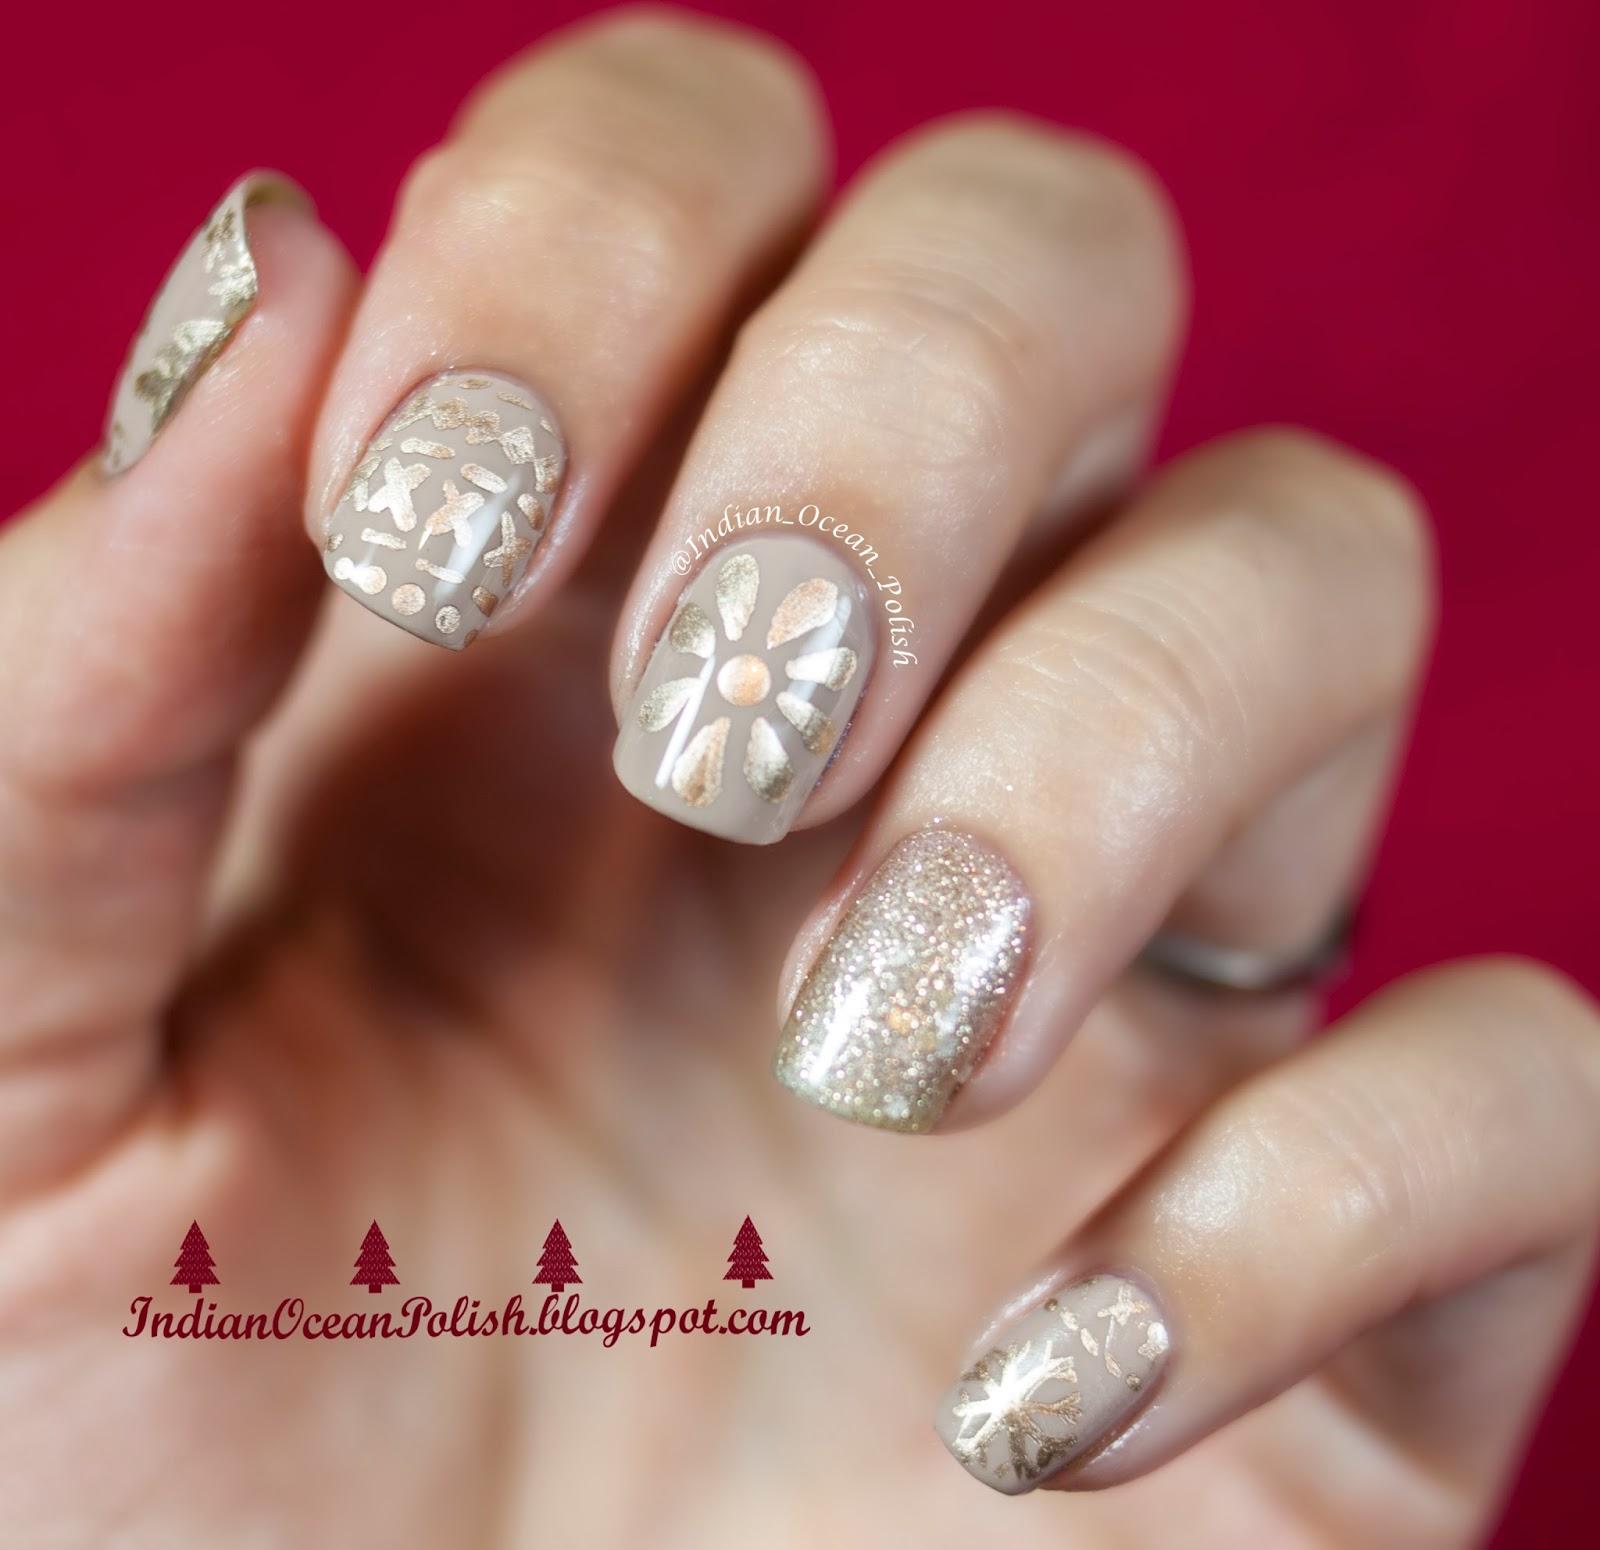 Christmas Finger Nail Art: Indian Ocean Polish: Christmas 2013 Nail Art Ideas: Simple